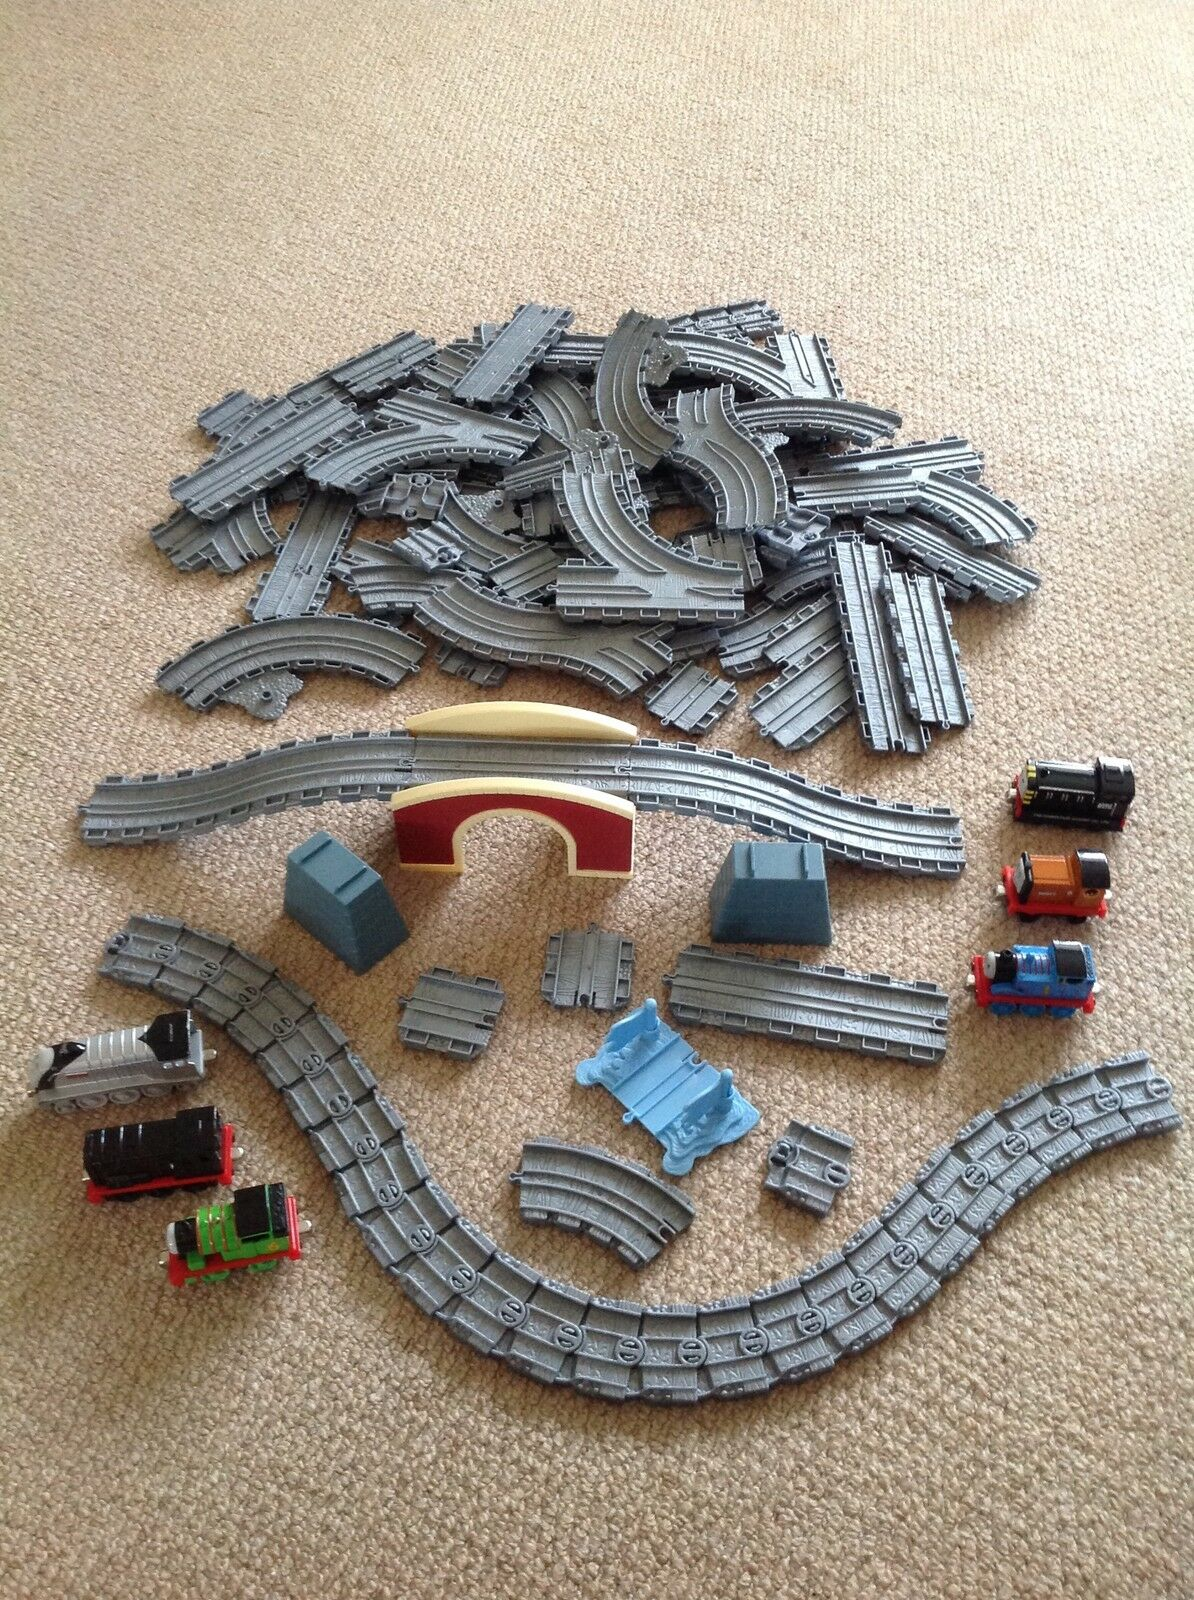 Thomas And freunde Take n Play  - 6 Engines & Track Sets Bundle